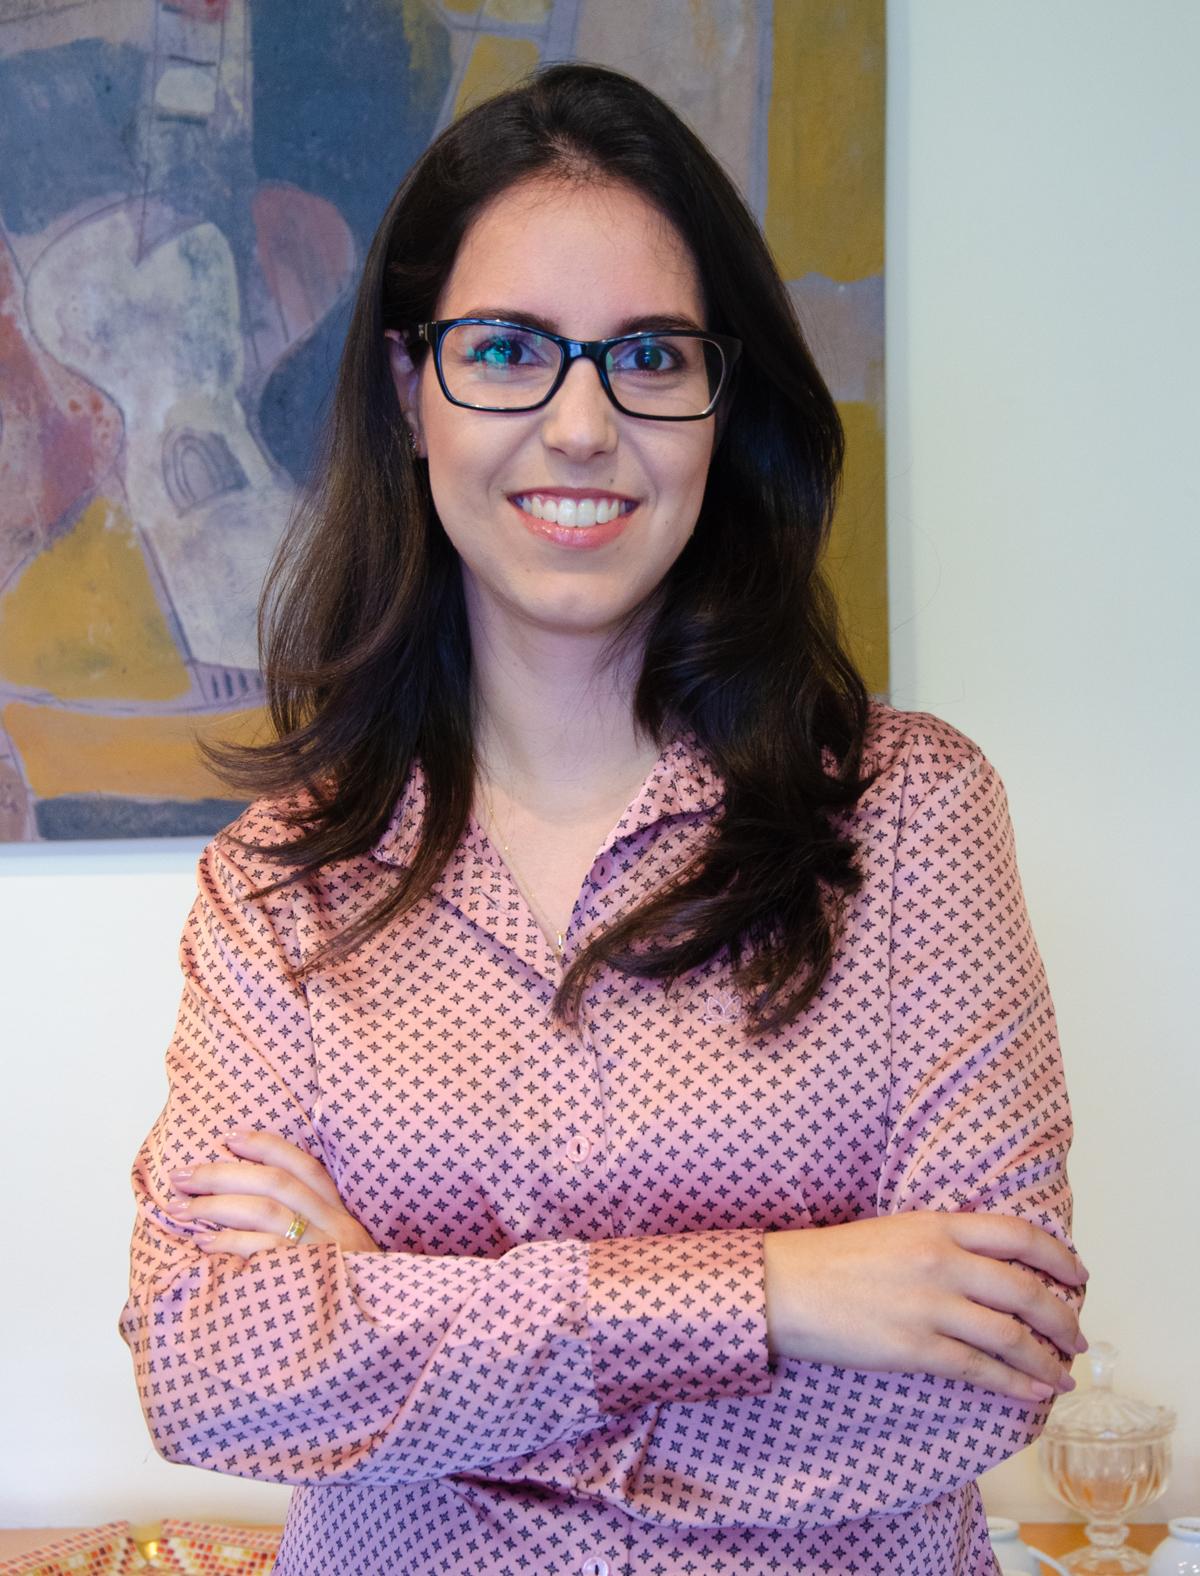 Laís Giovanna de Melo Guimarães - OAB 157.201